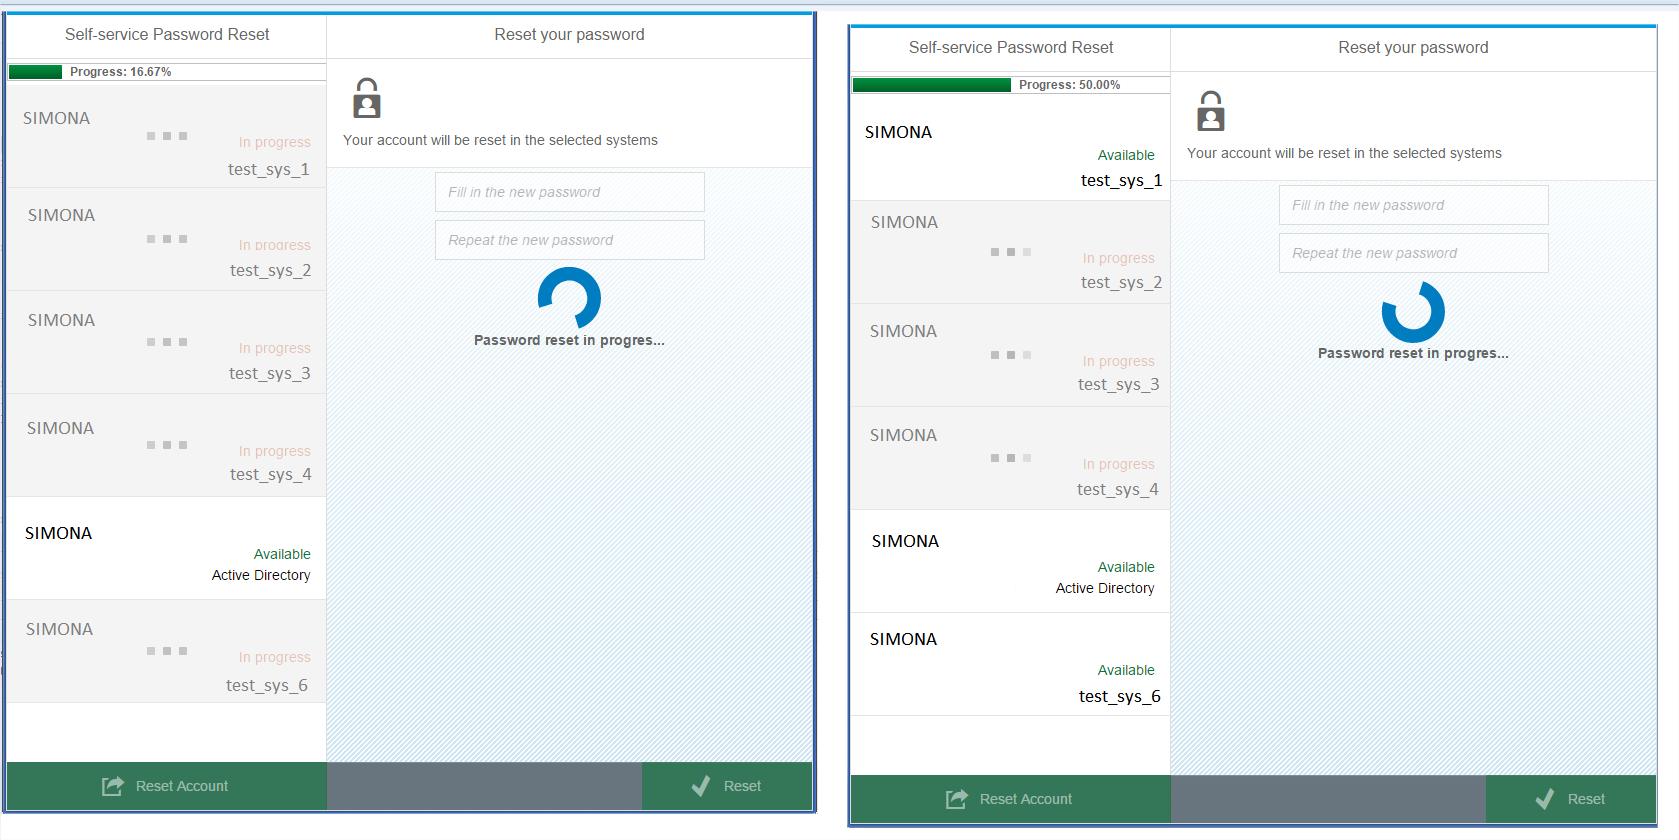 SAP IdM SAPUI5 Custom Add-on for Password Reset/Change | SAP